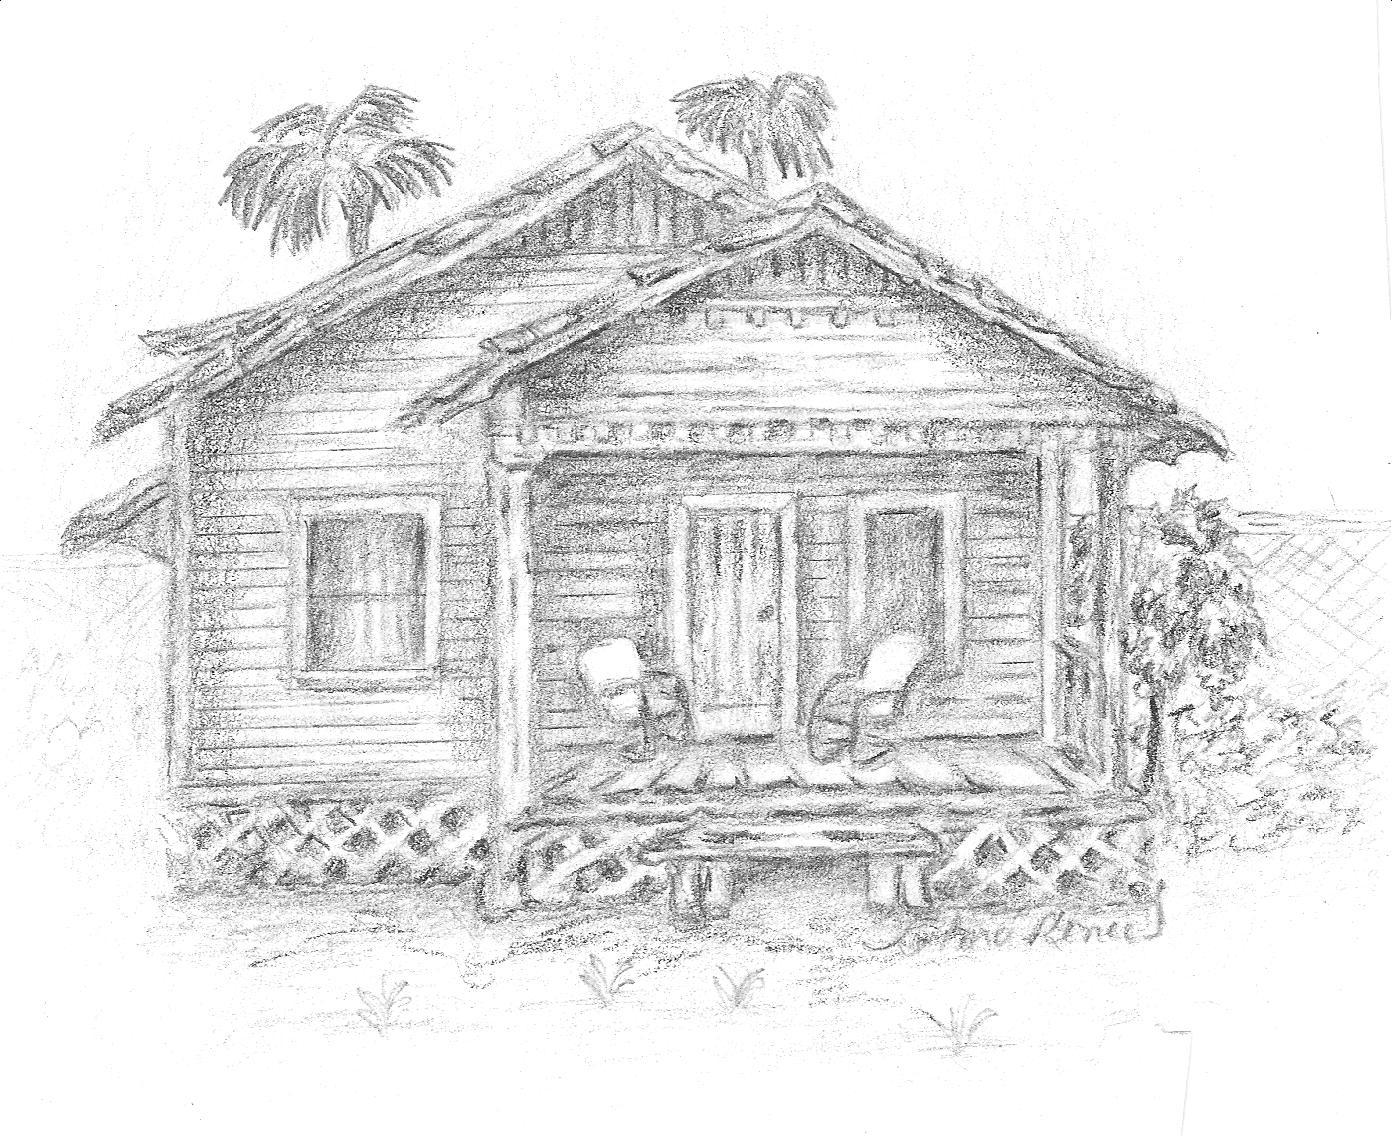 Mis Dibujos A Lápiz: Junio 2009